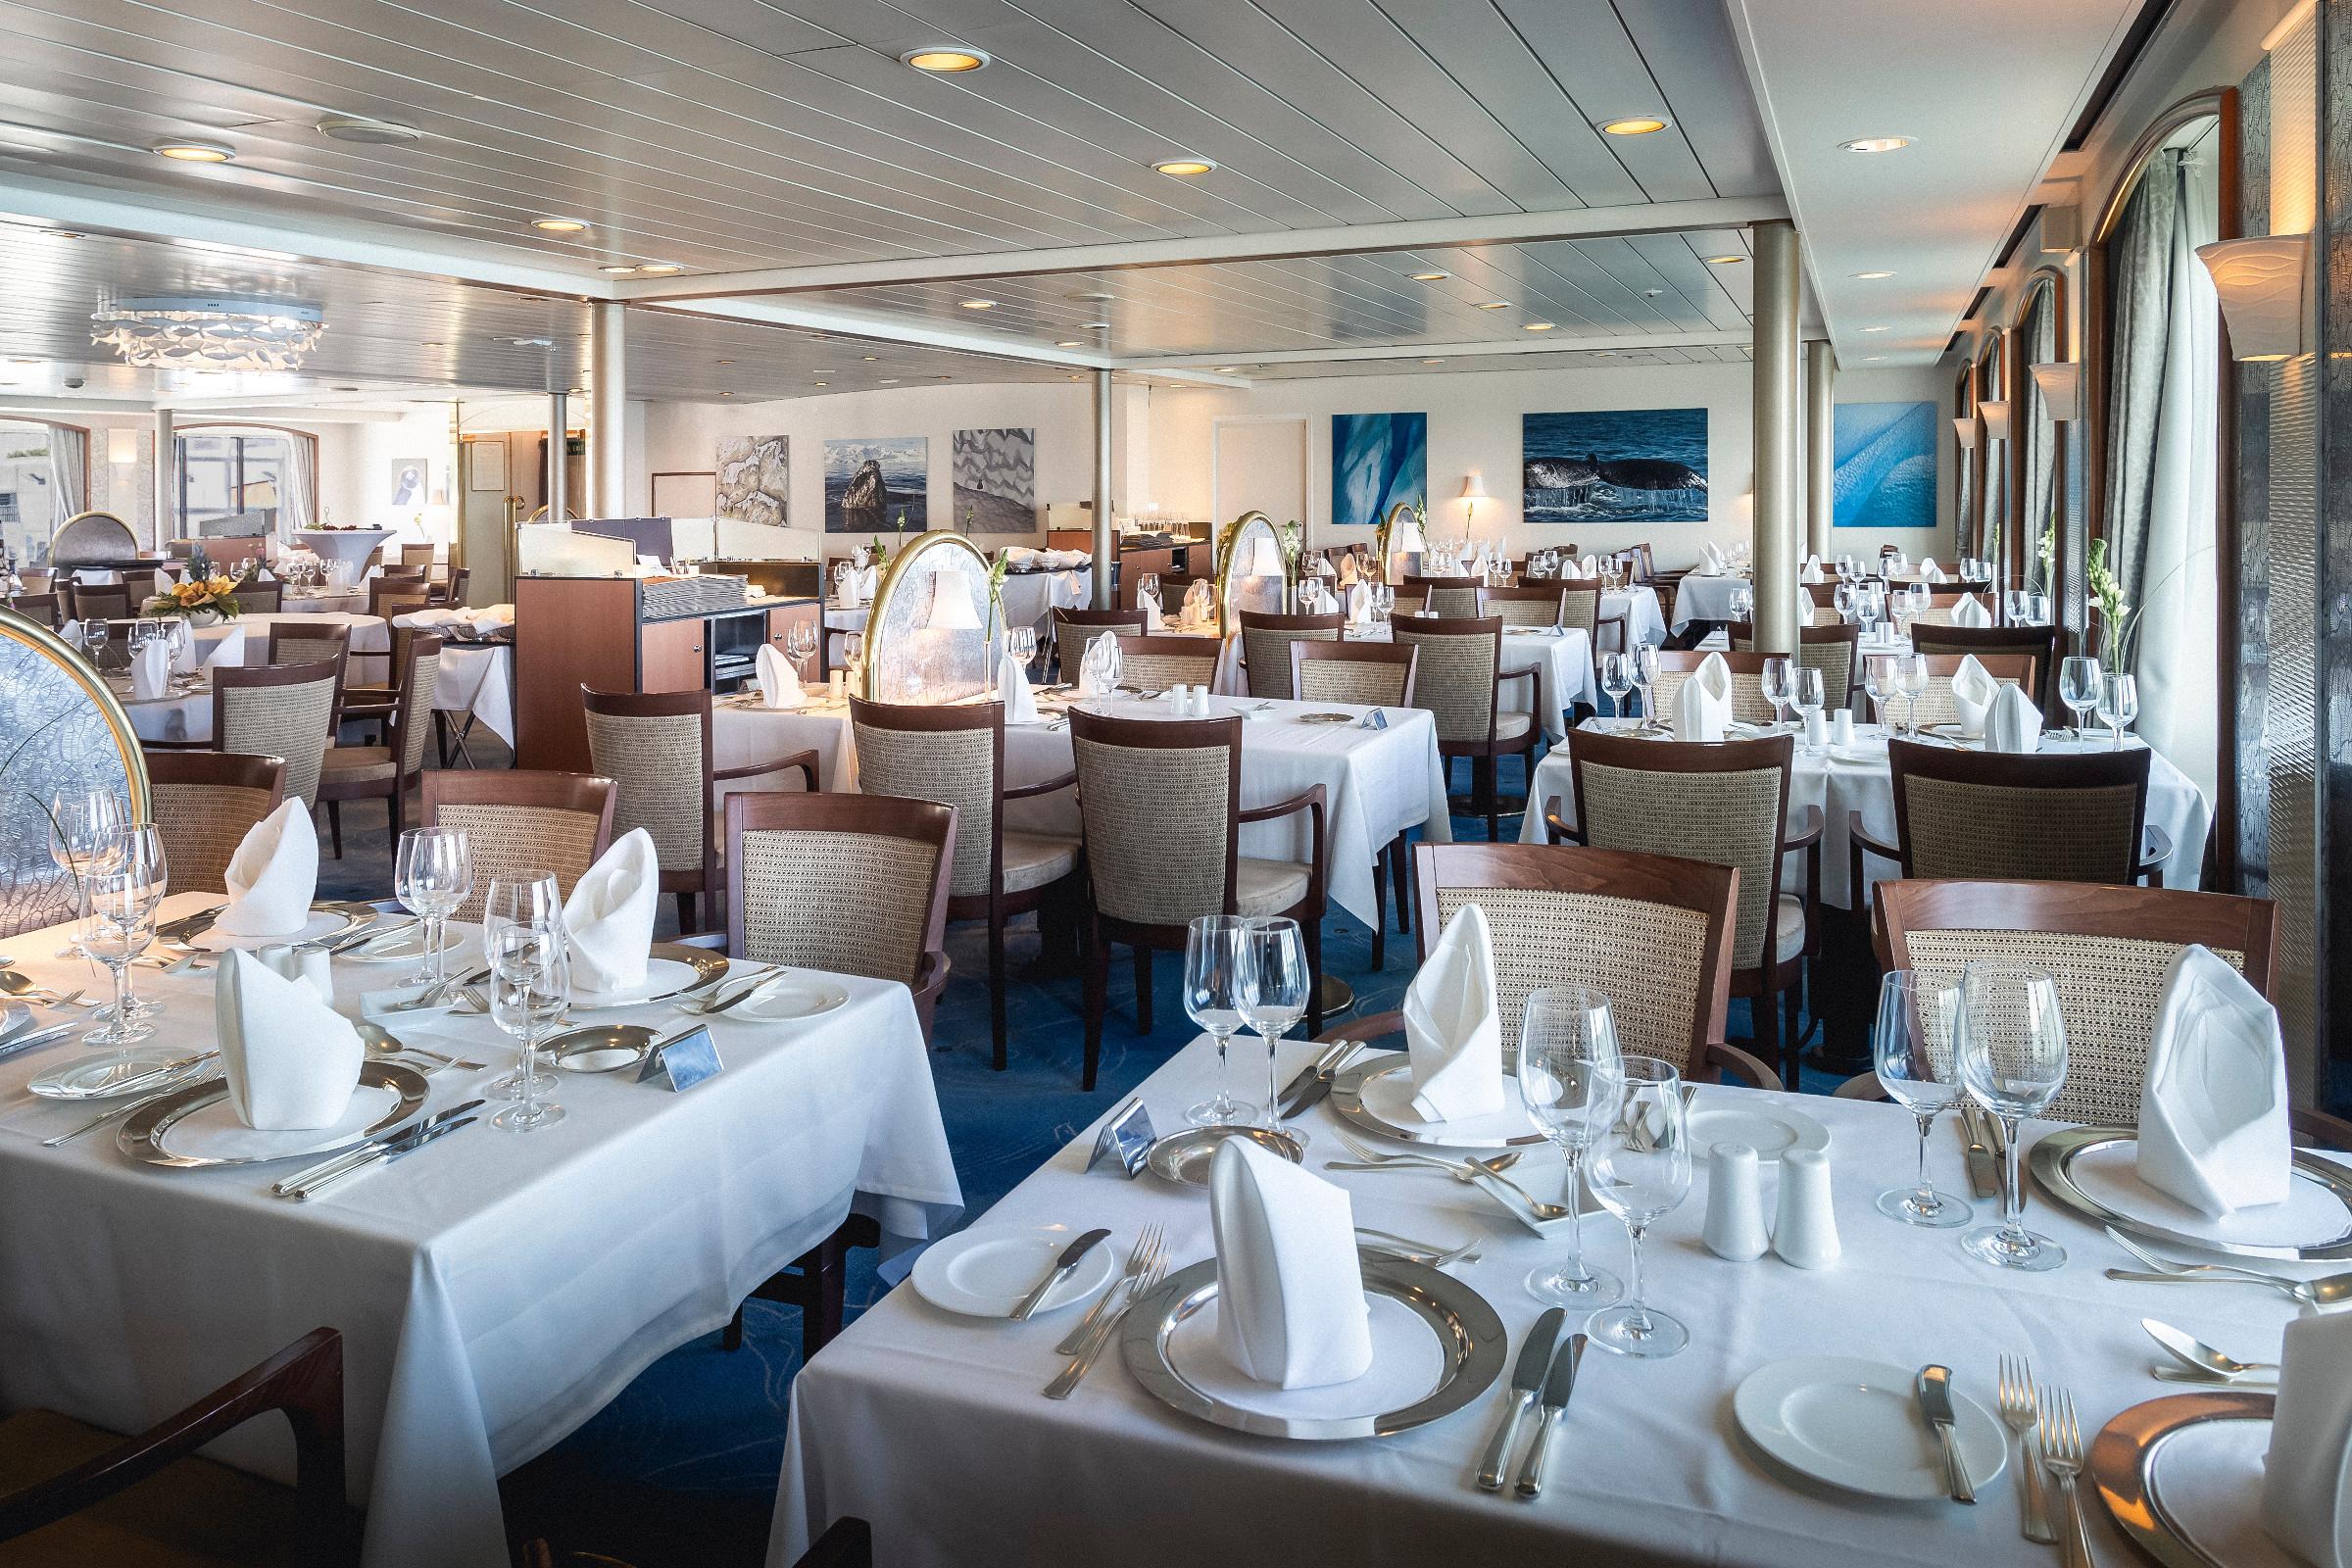 MS-Seaventure-Dining Room-2